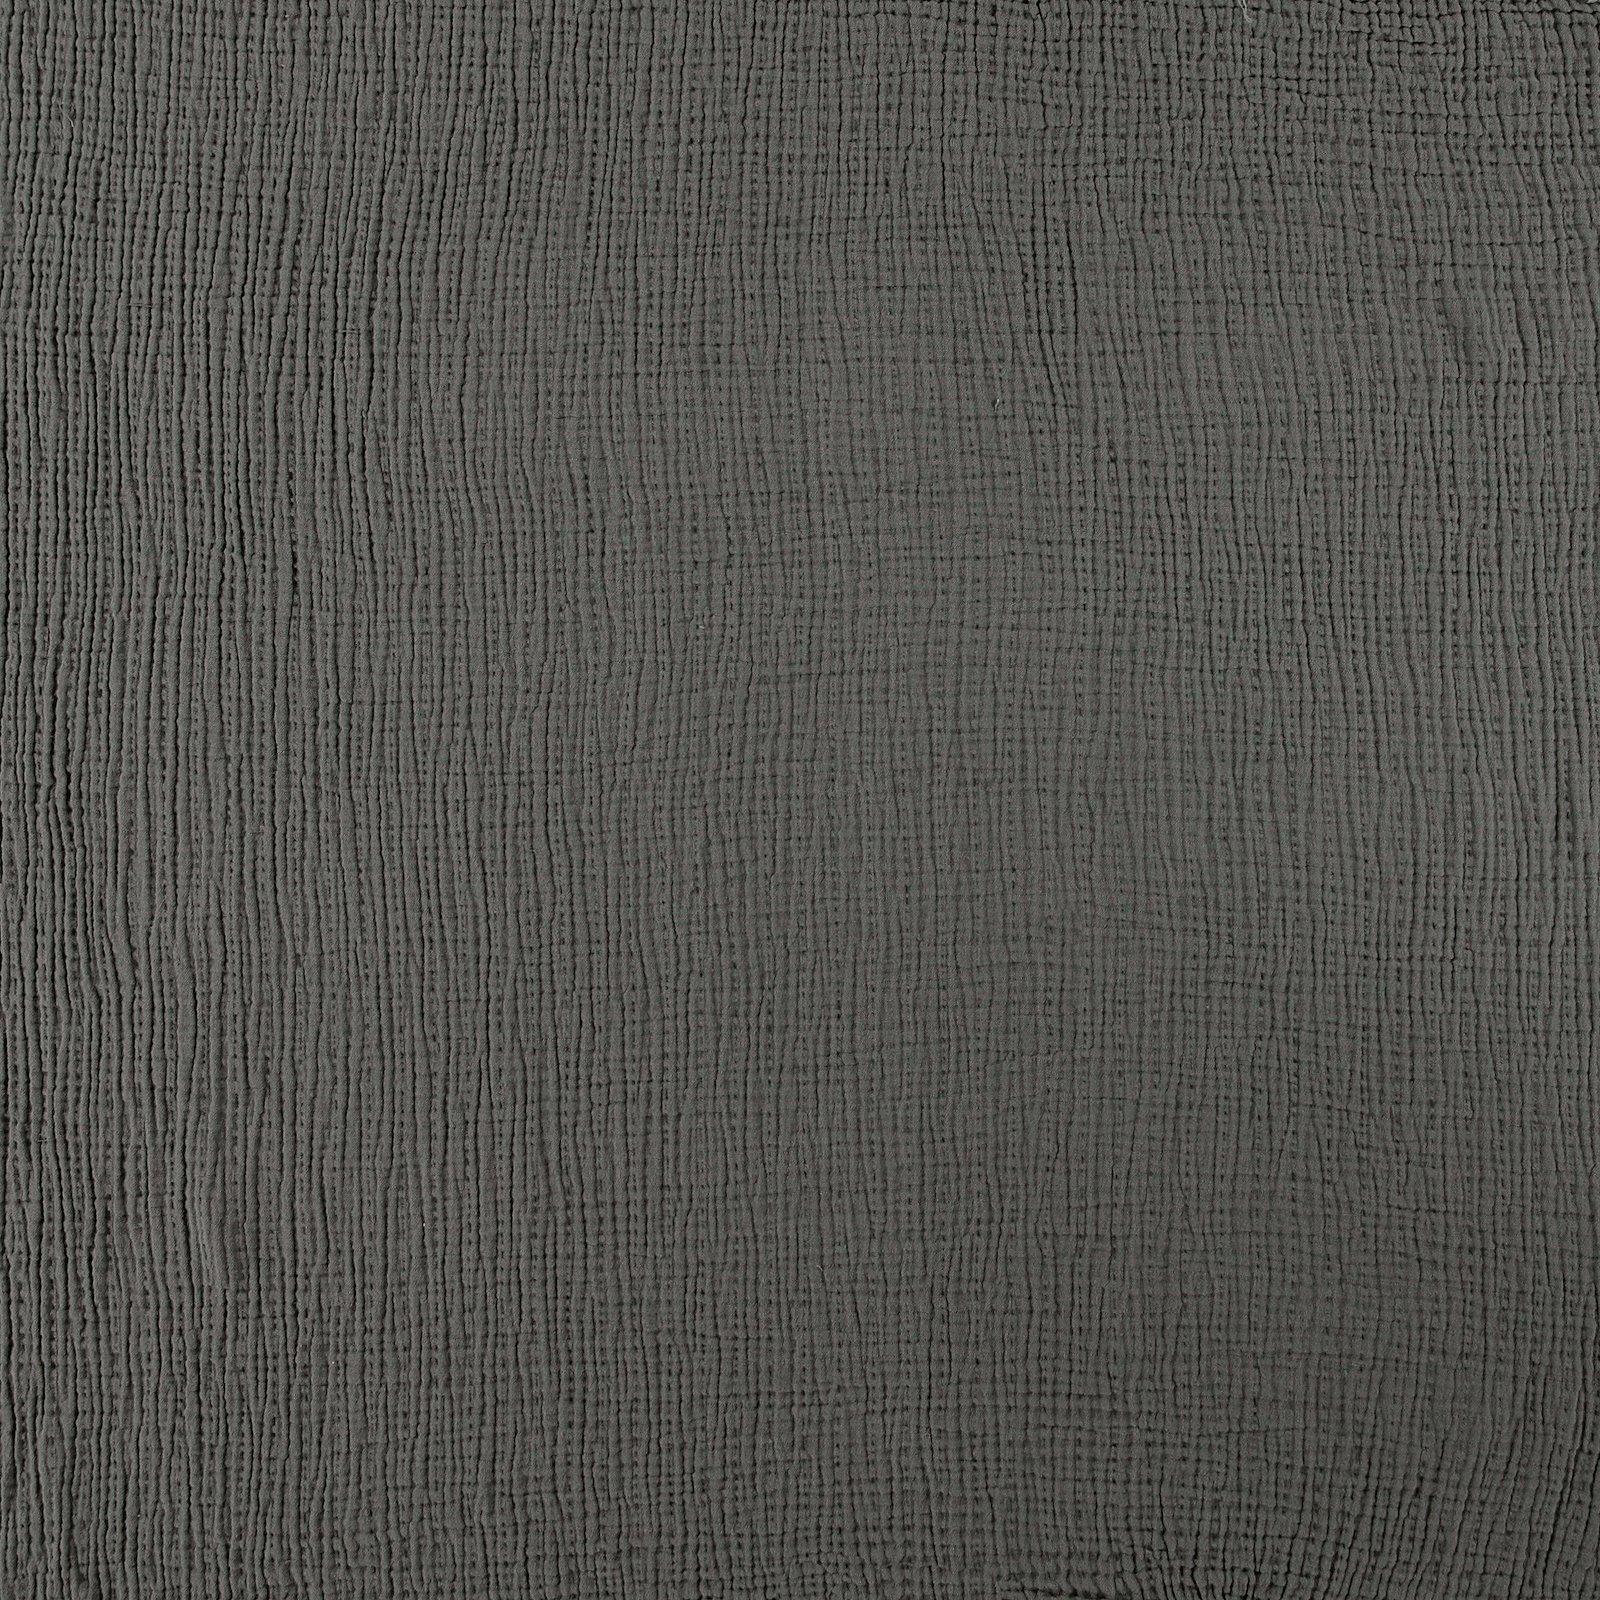 Muslin dark grey 501622_pack_solid_b